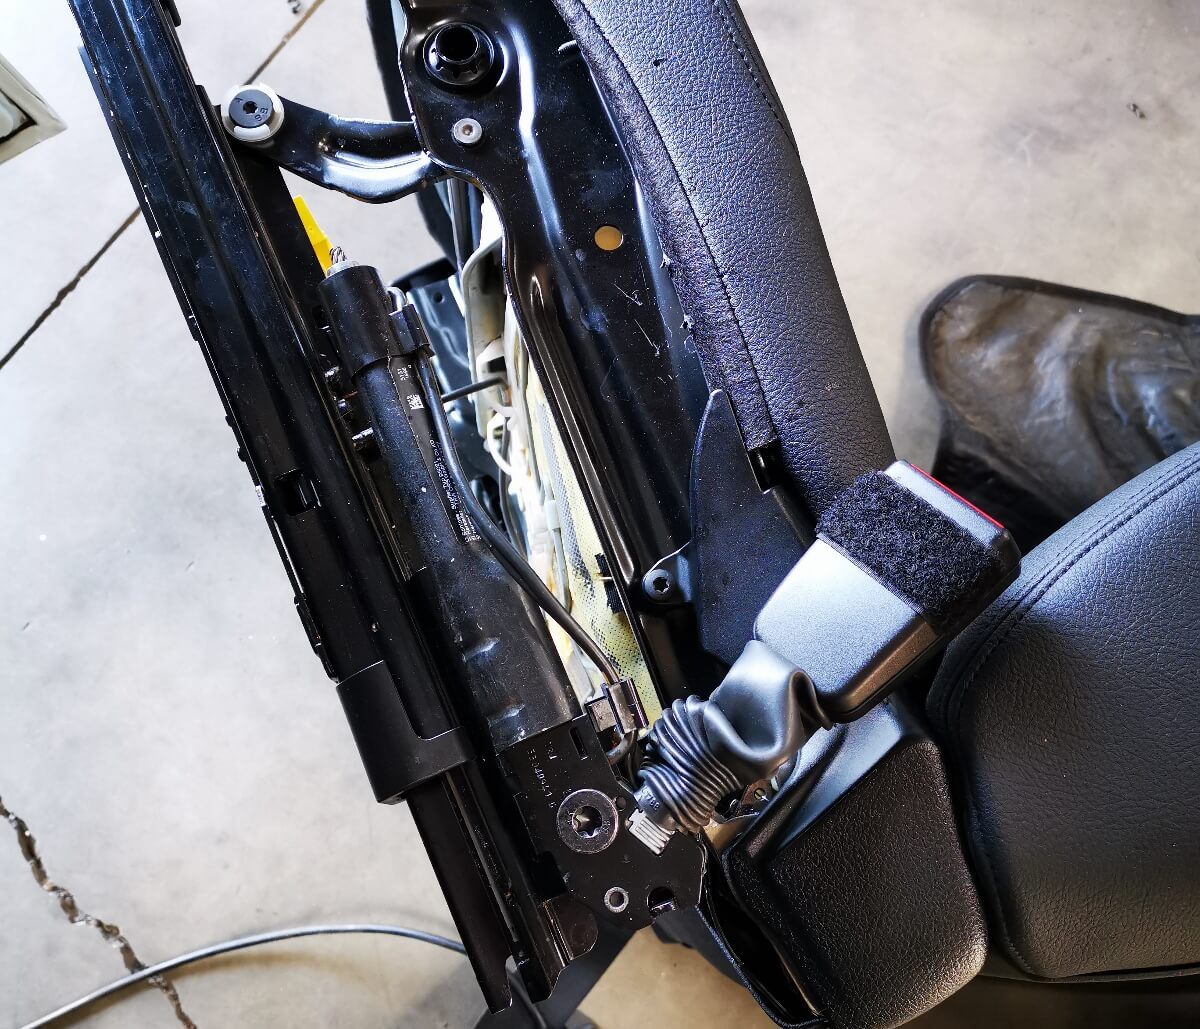 BMW 118i F20 - replacing front seat belt igniter at GP Motor Works